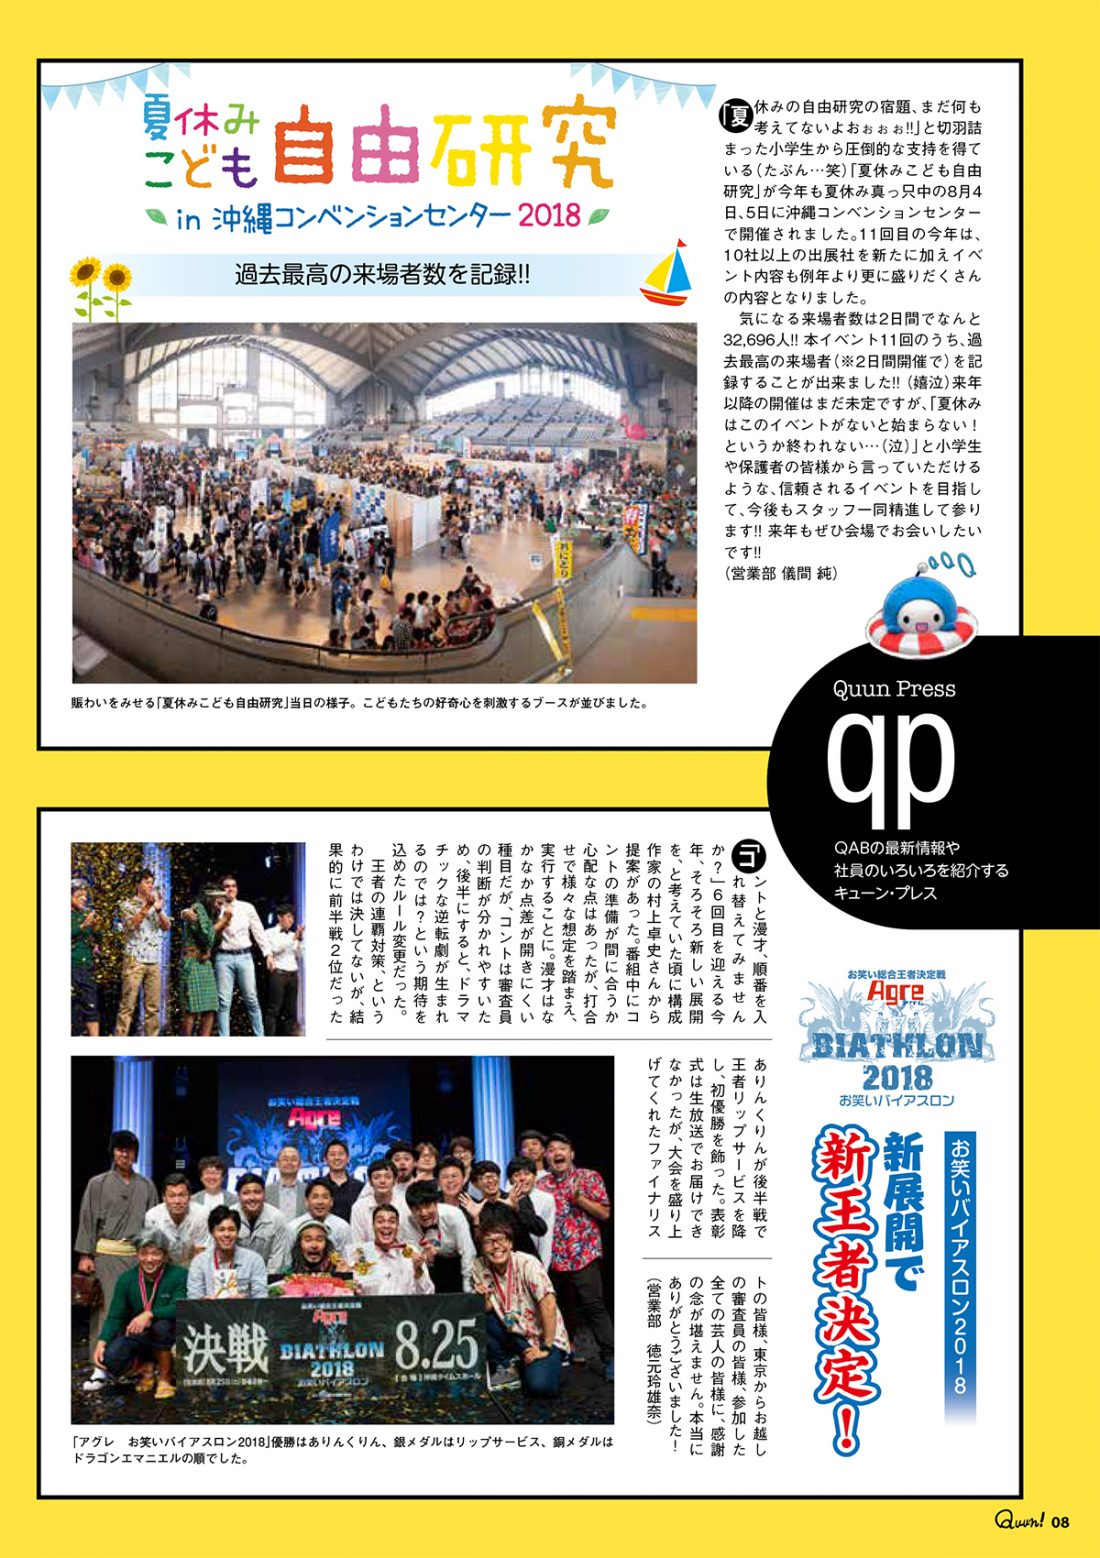 https://www.qab.co.jp/qgoro/wp-content/uploads/quun_1010-1100x1558.jpg